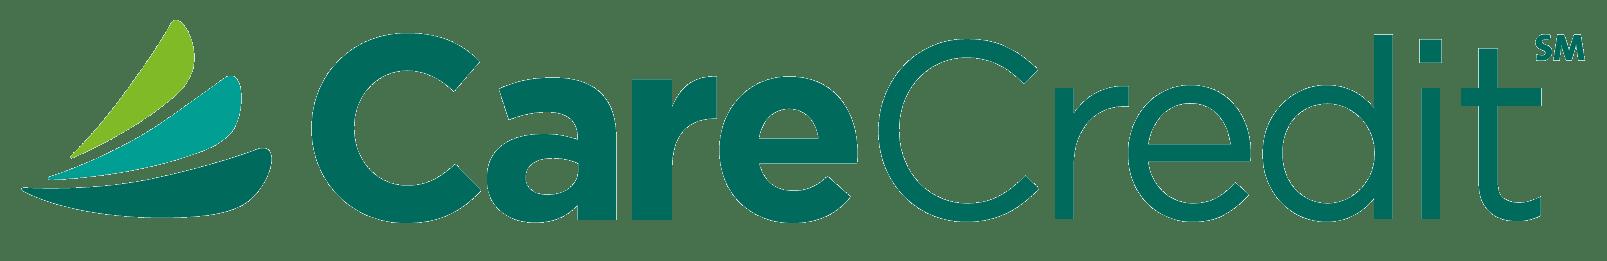 CareCredit-New-Logo1